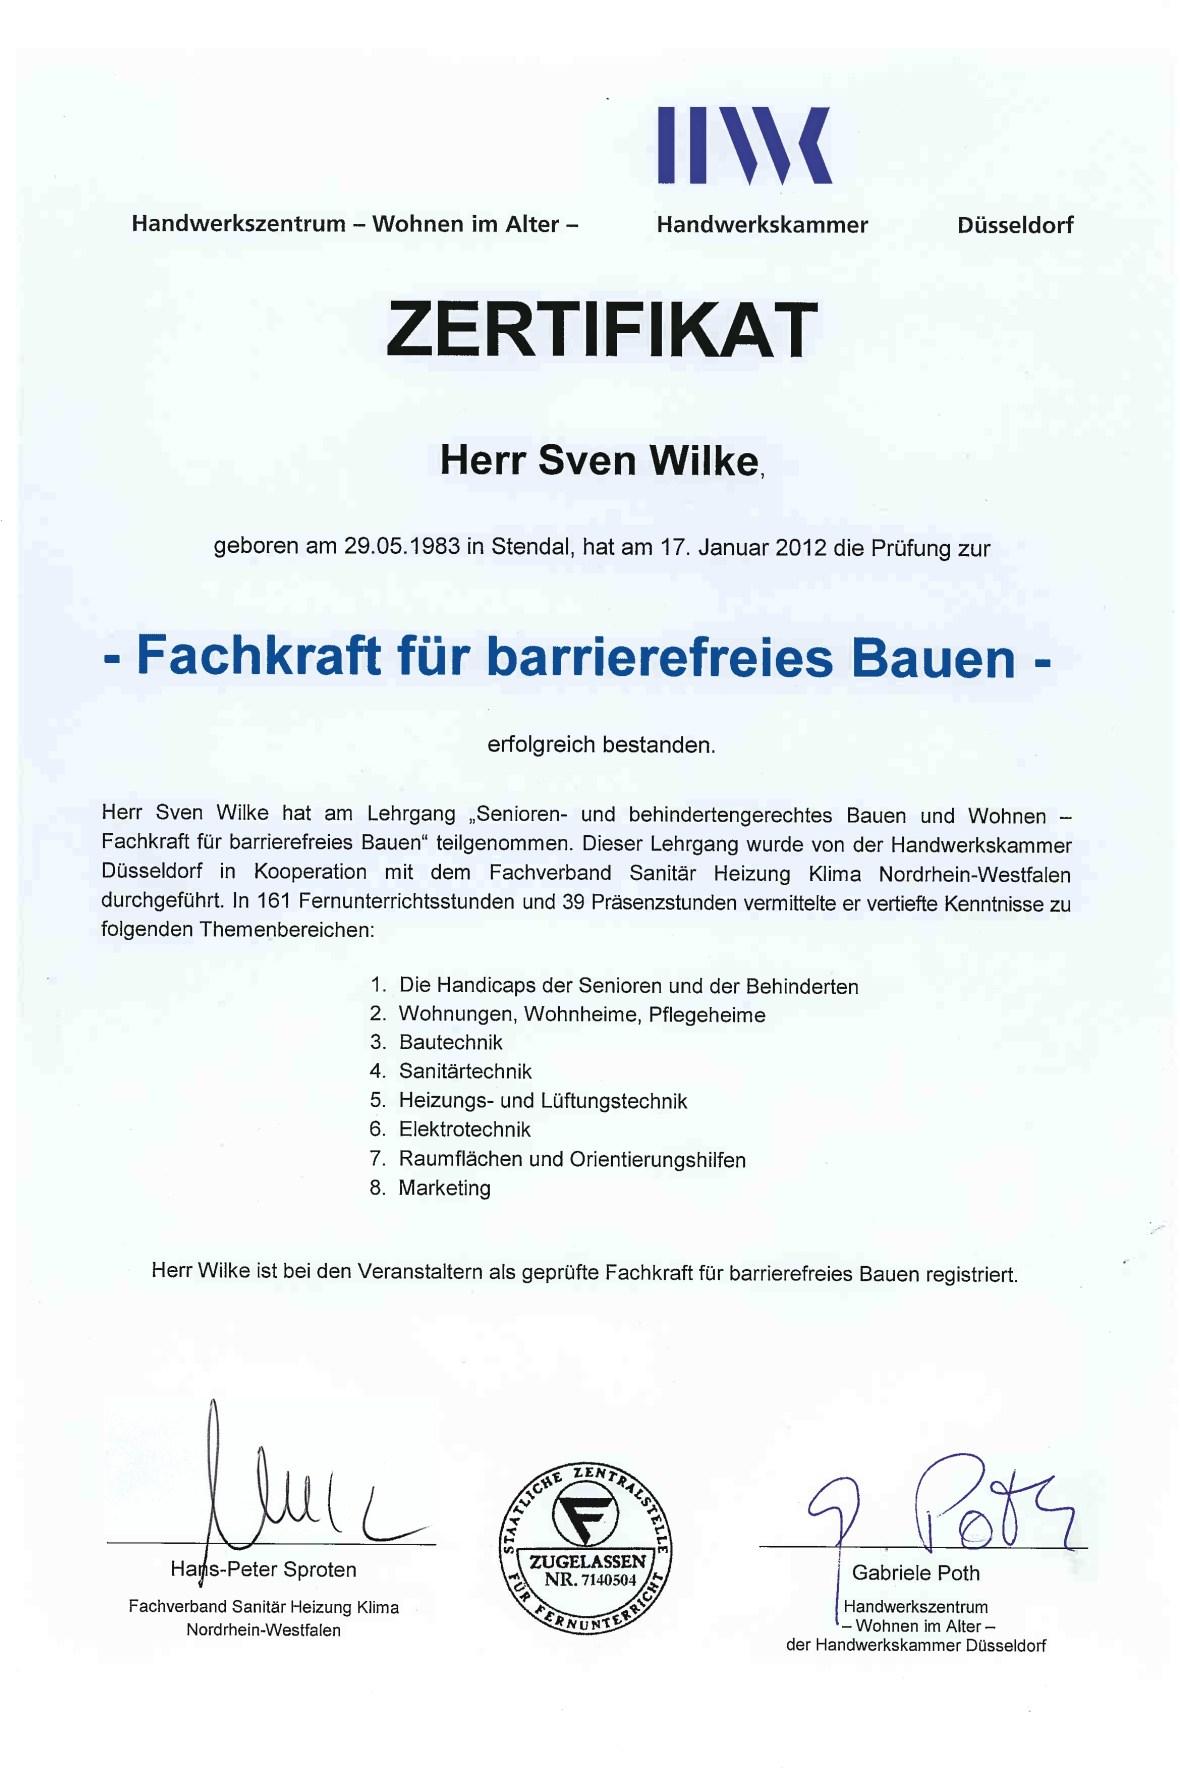 Urkunde Sven Wilke; Zertifikat Sven Wilke; Diplom Sven Wilke; Fliesenfachbetrieb Wilke; Fliesenfachbetrieb Sven Wilke; Fliesenfachbetrieb Sven Wilke Solingen;